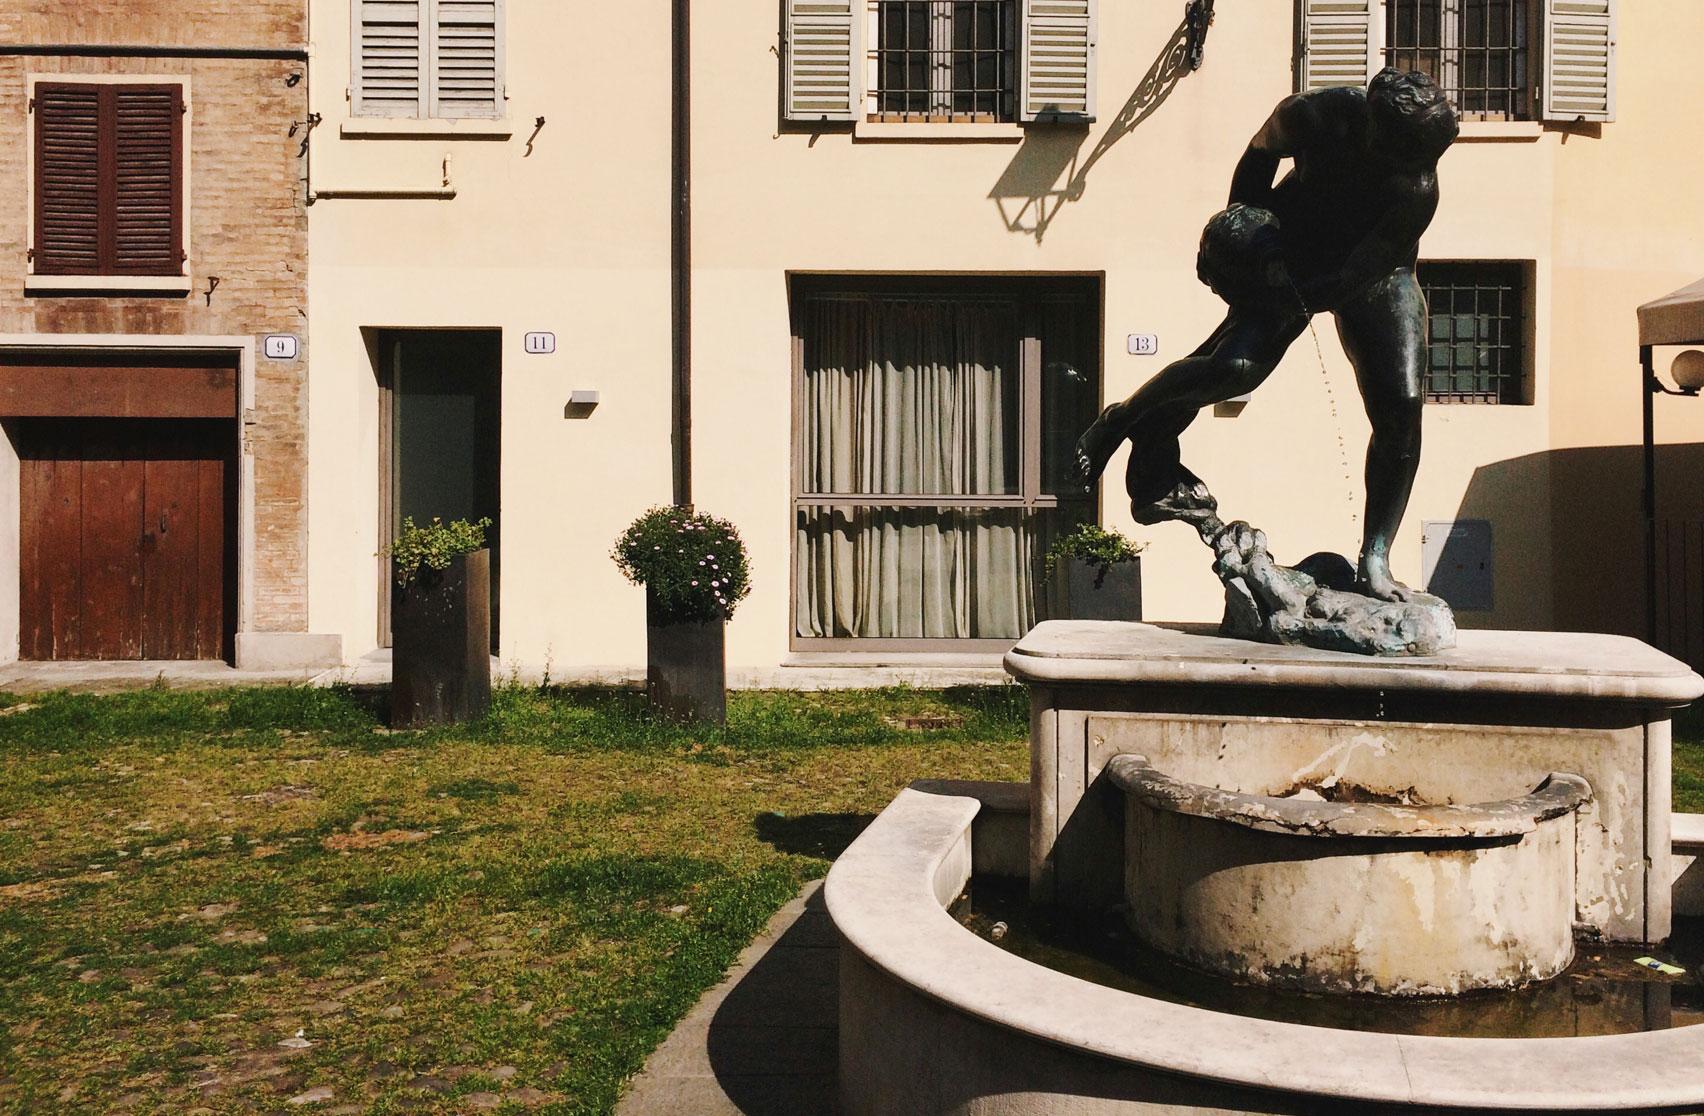 La_Modena_dei_canali_Largo_San_Giacomo